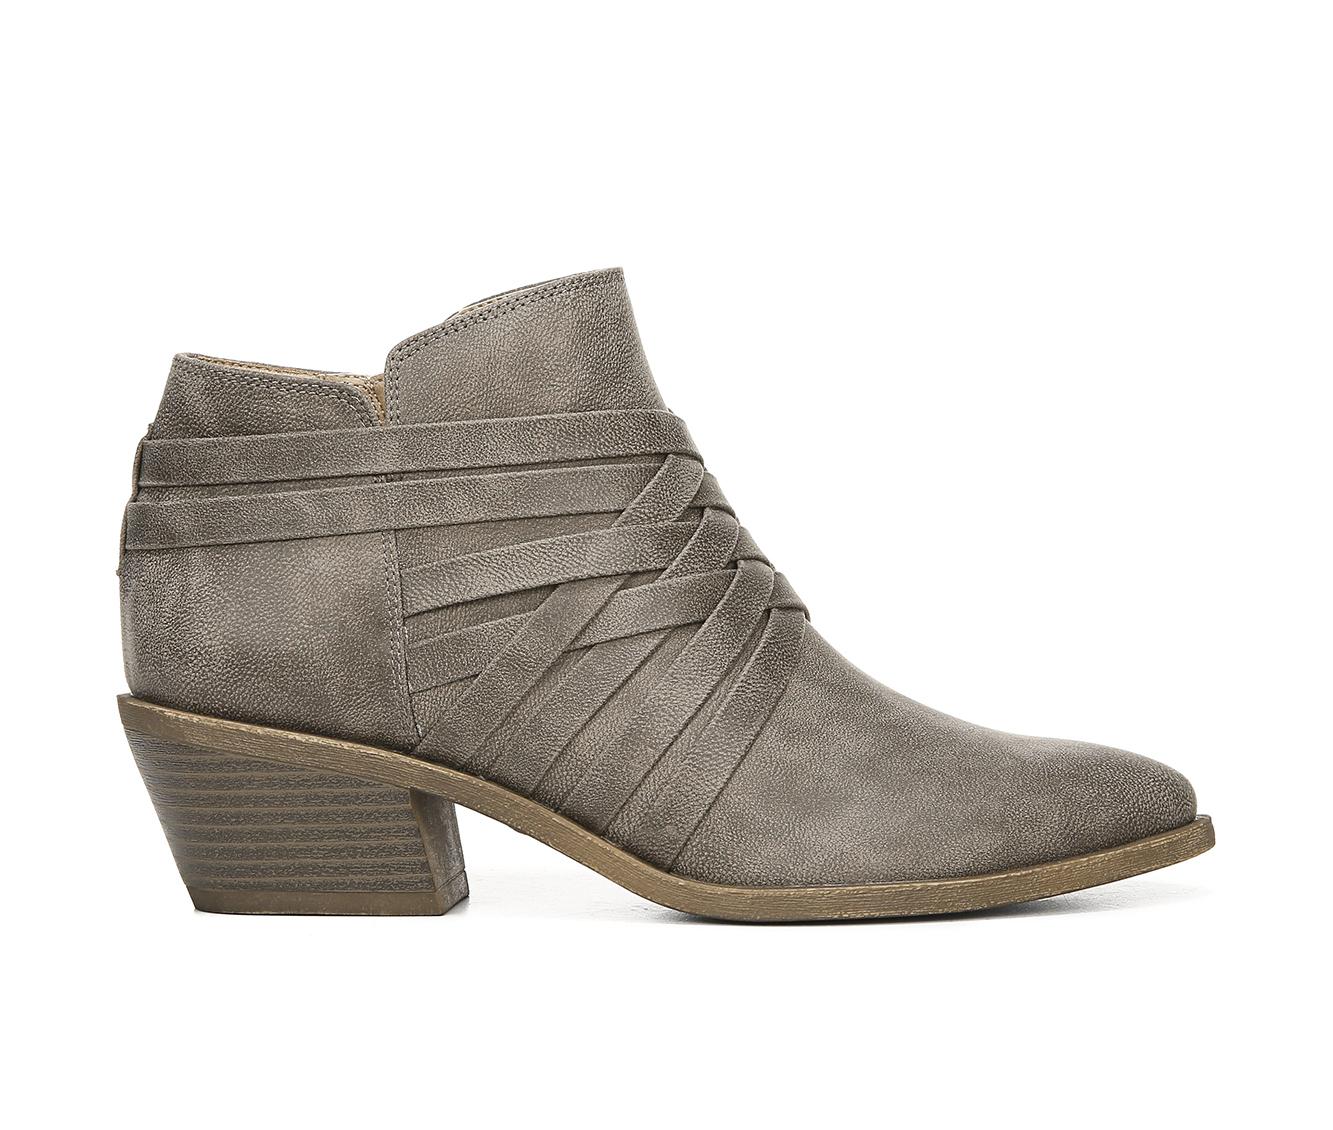 LifeStride Prairie Women's Boots (Gray - Faux Leather)